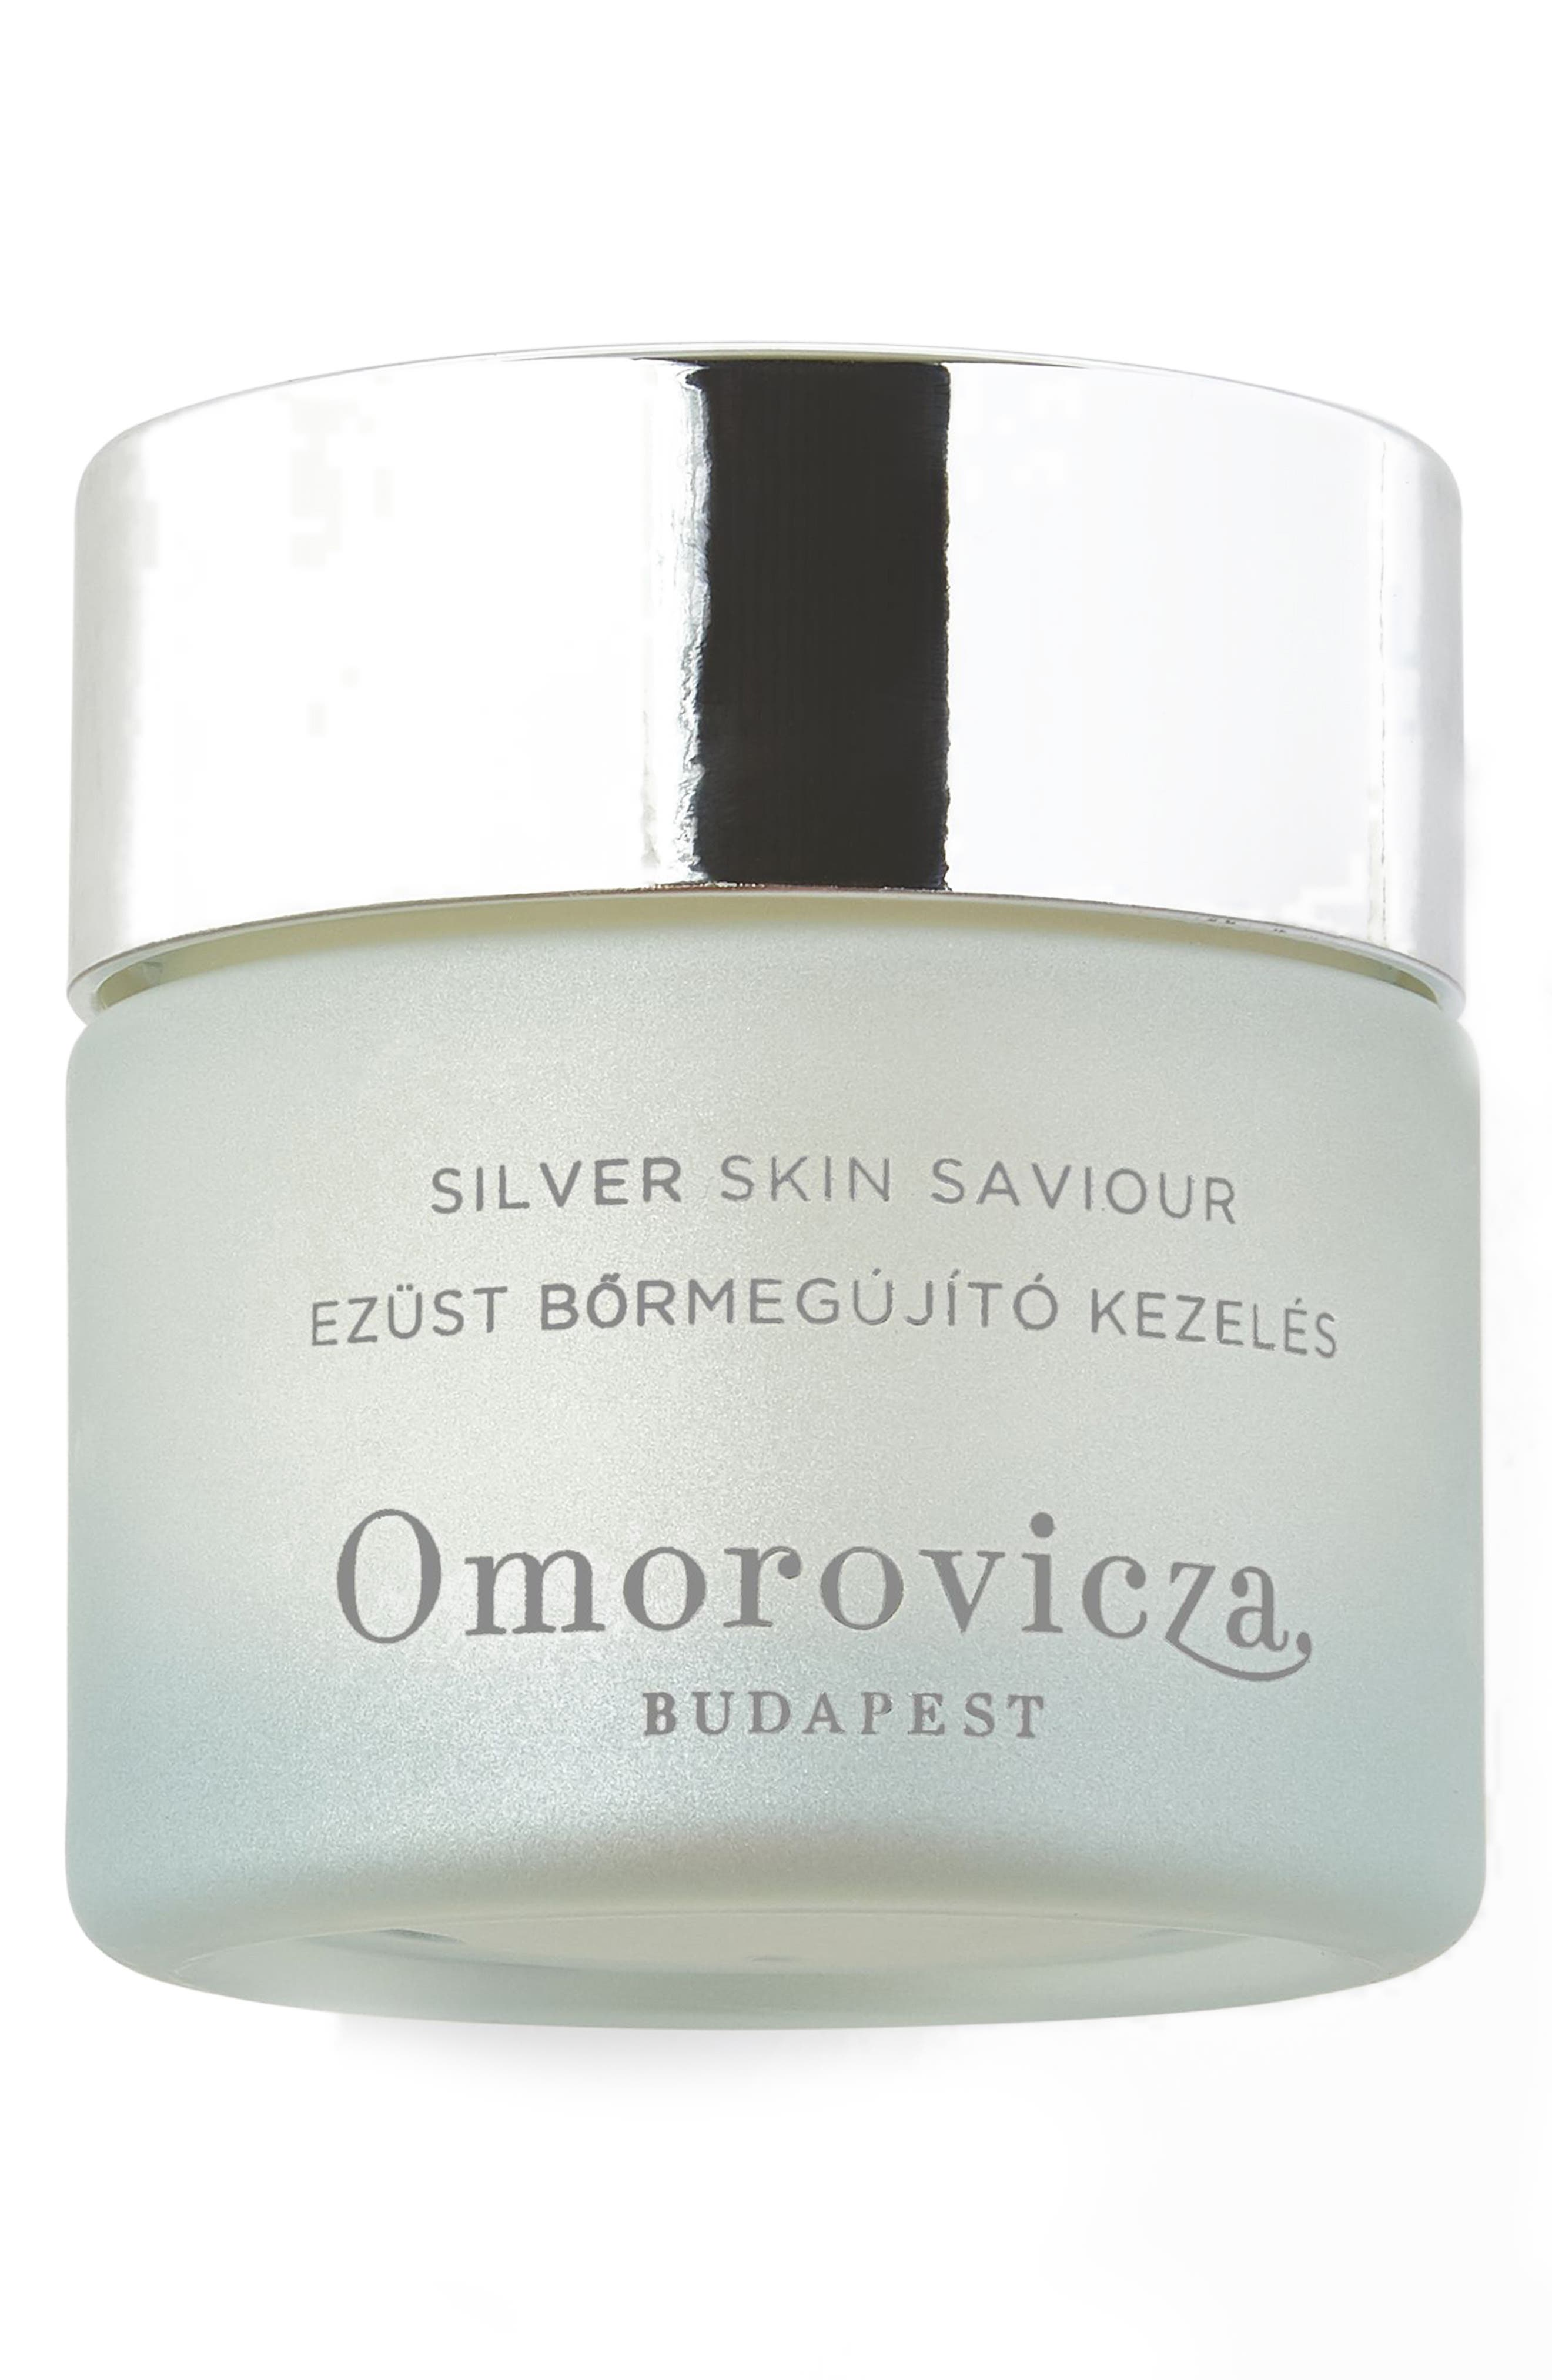 Silver Skin Saviour Face Mask,                             Alternate thumbnail 5, color,                             NO COLOR